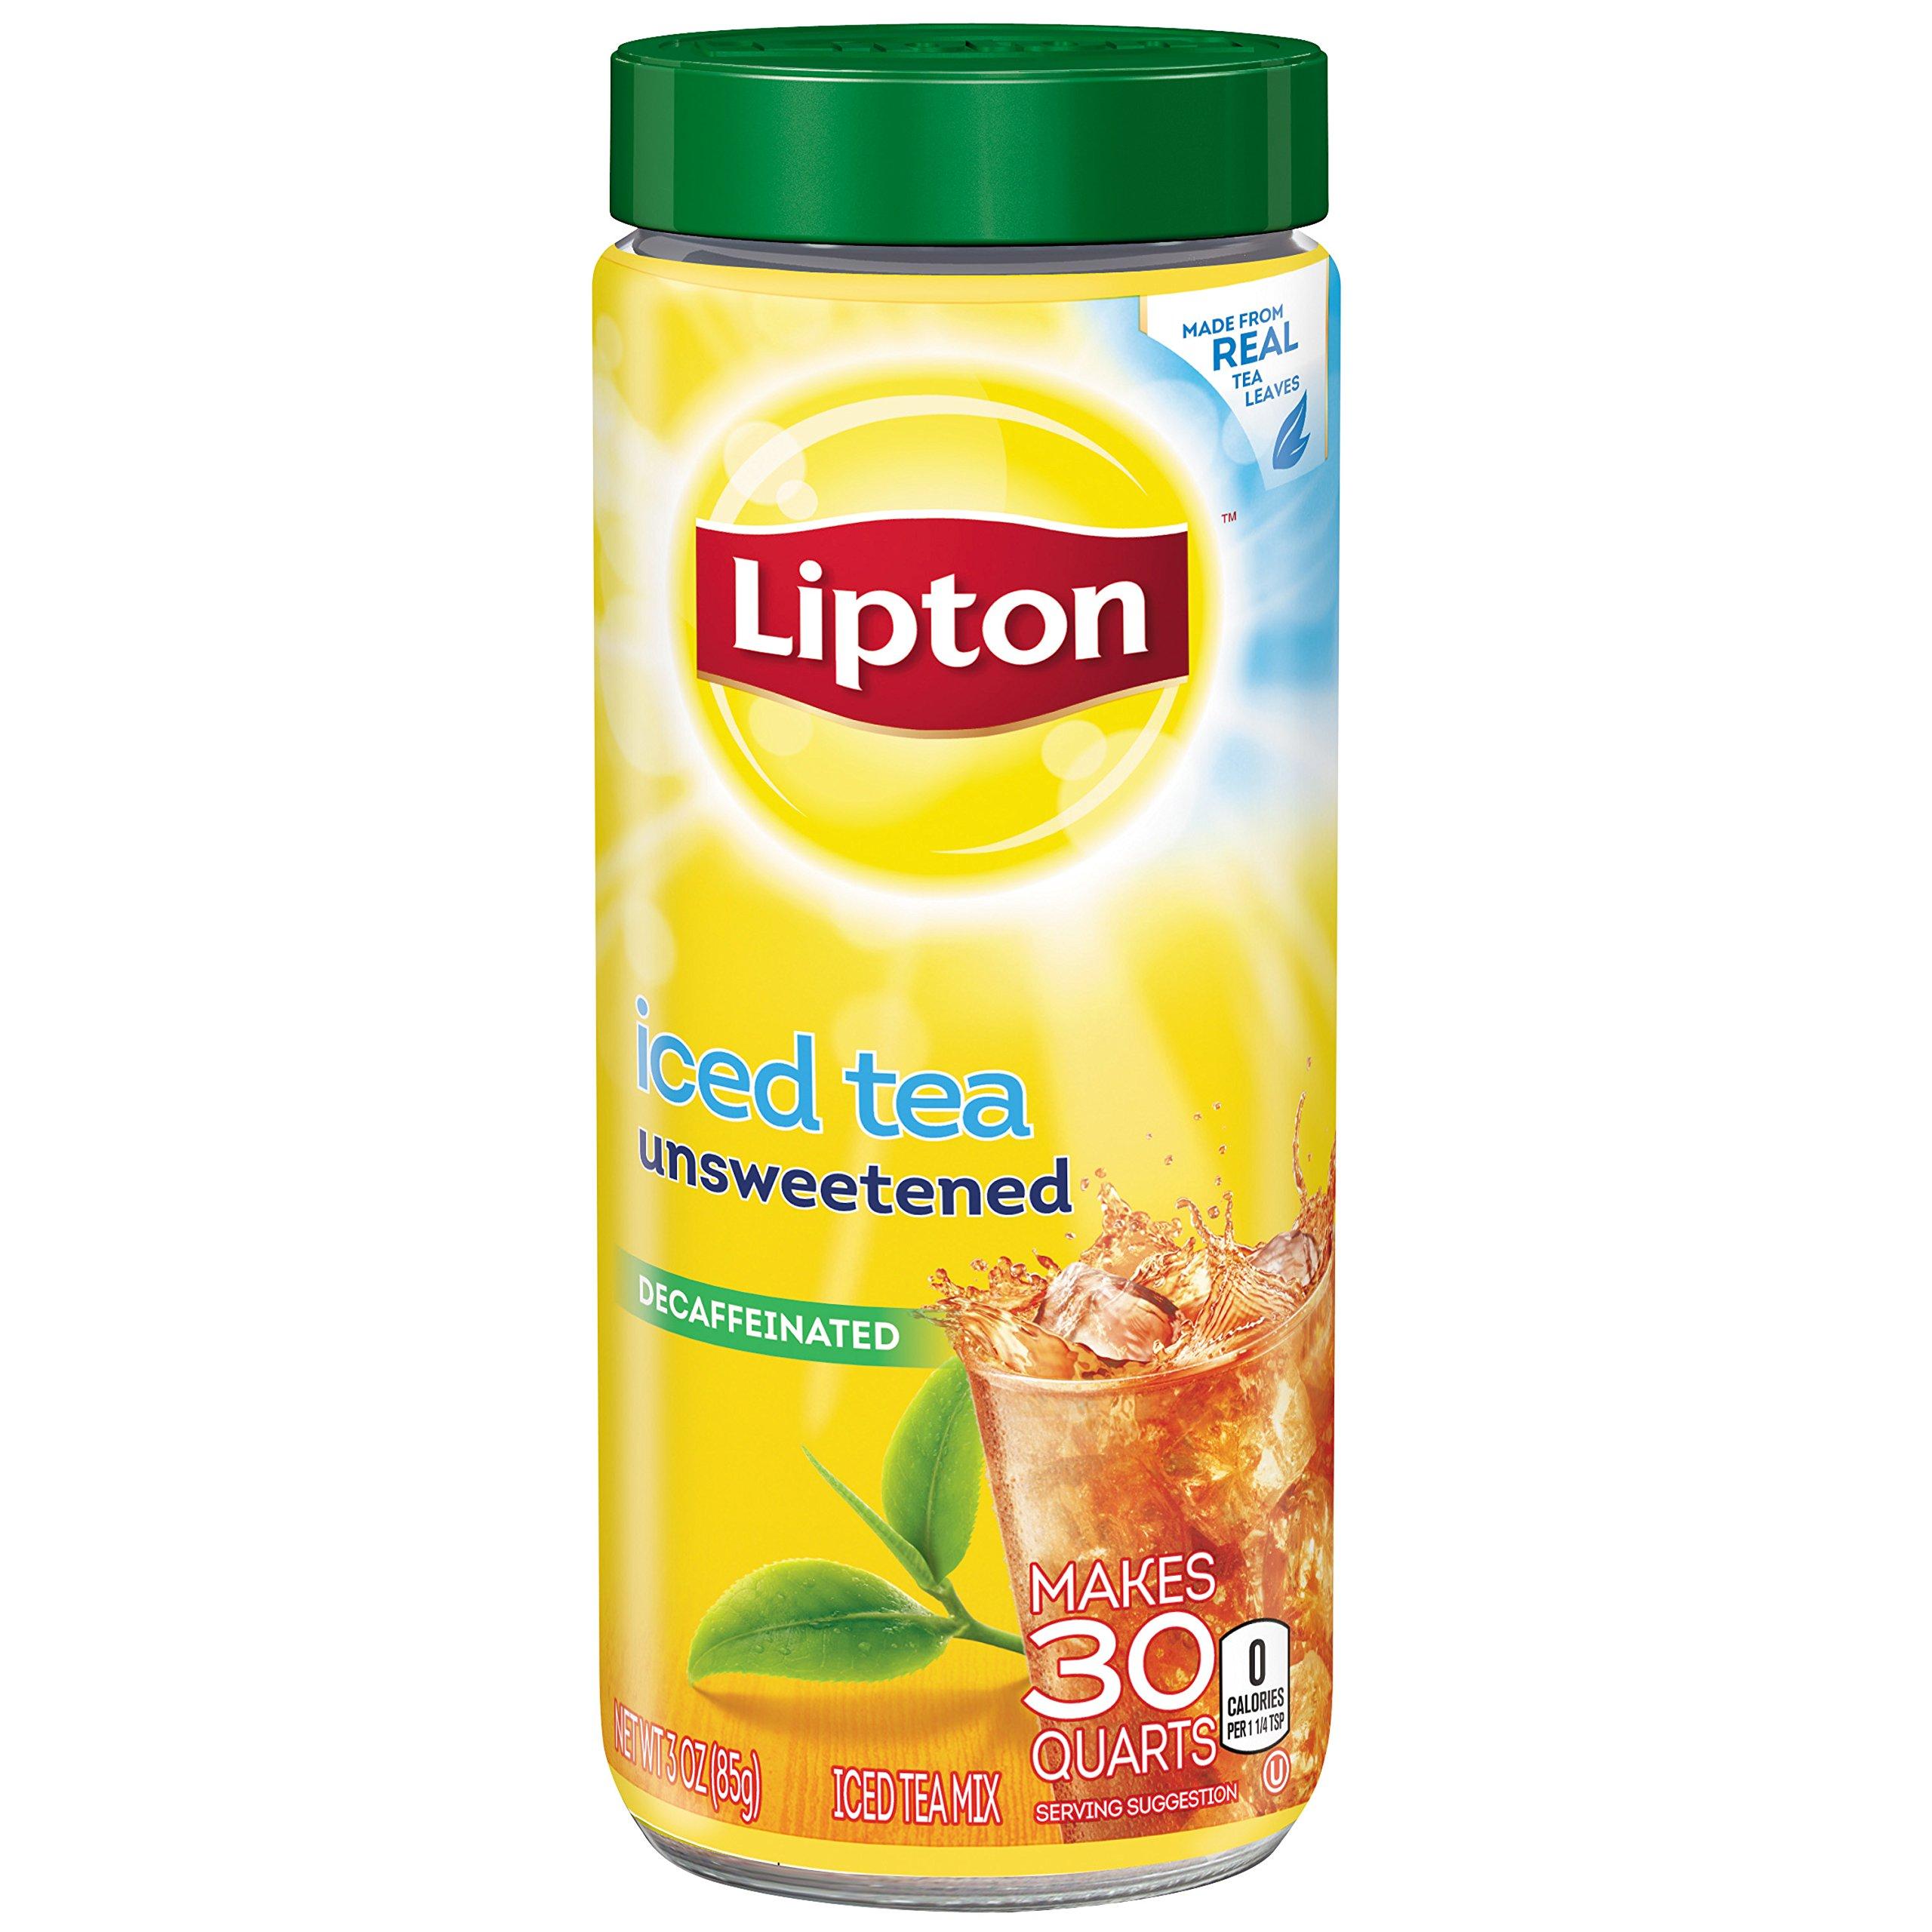 Lipton Iced Tea Mix Decaffeinated Unsweetened 30 Qt Pack